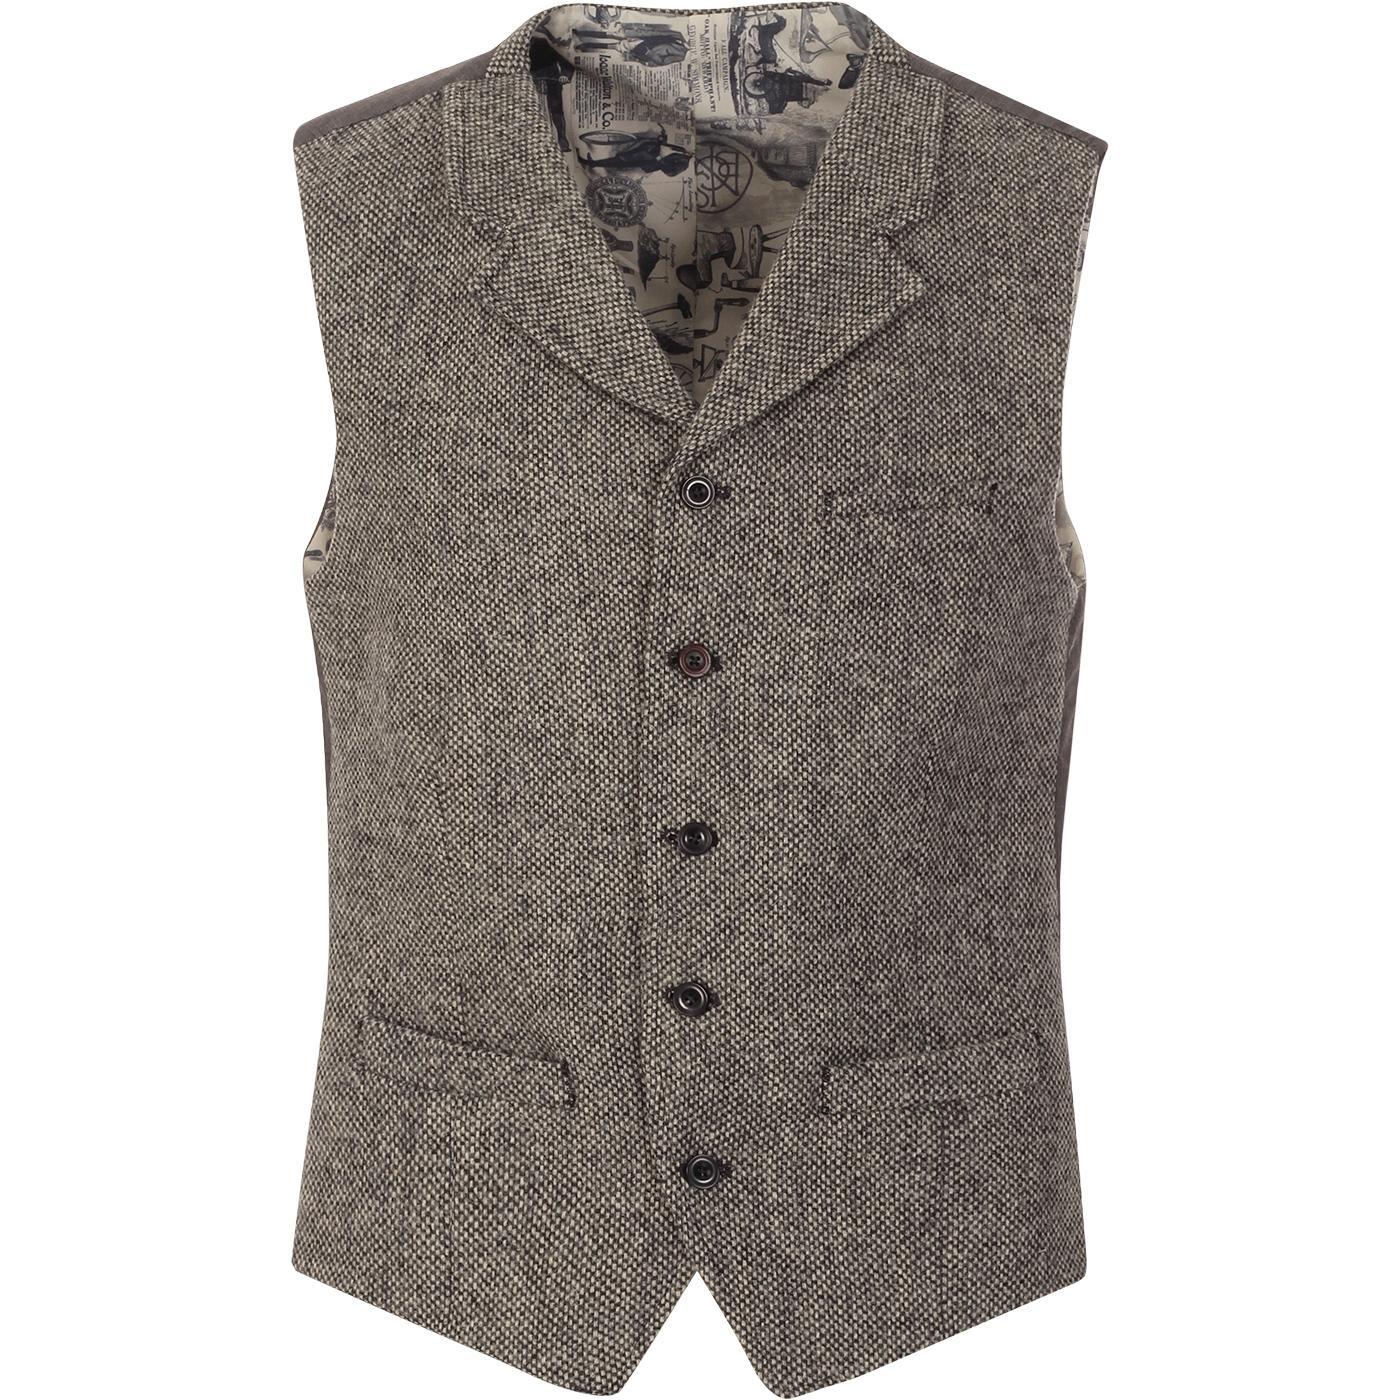 GIBSON LONDON Grey Shetland Birdseye Waistcoat